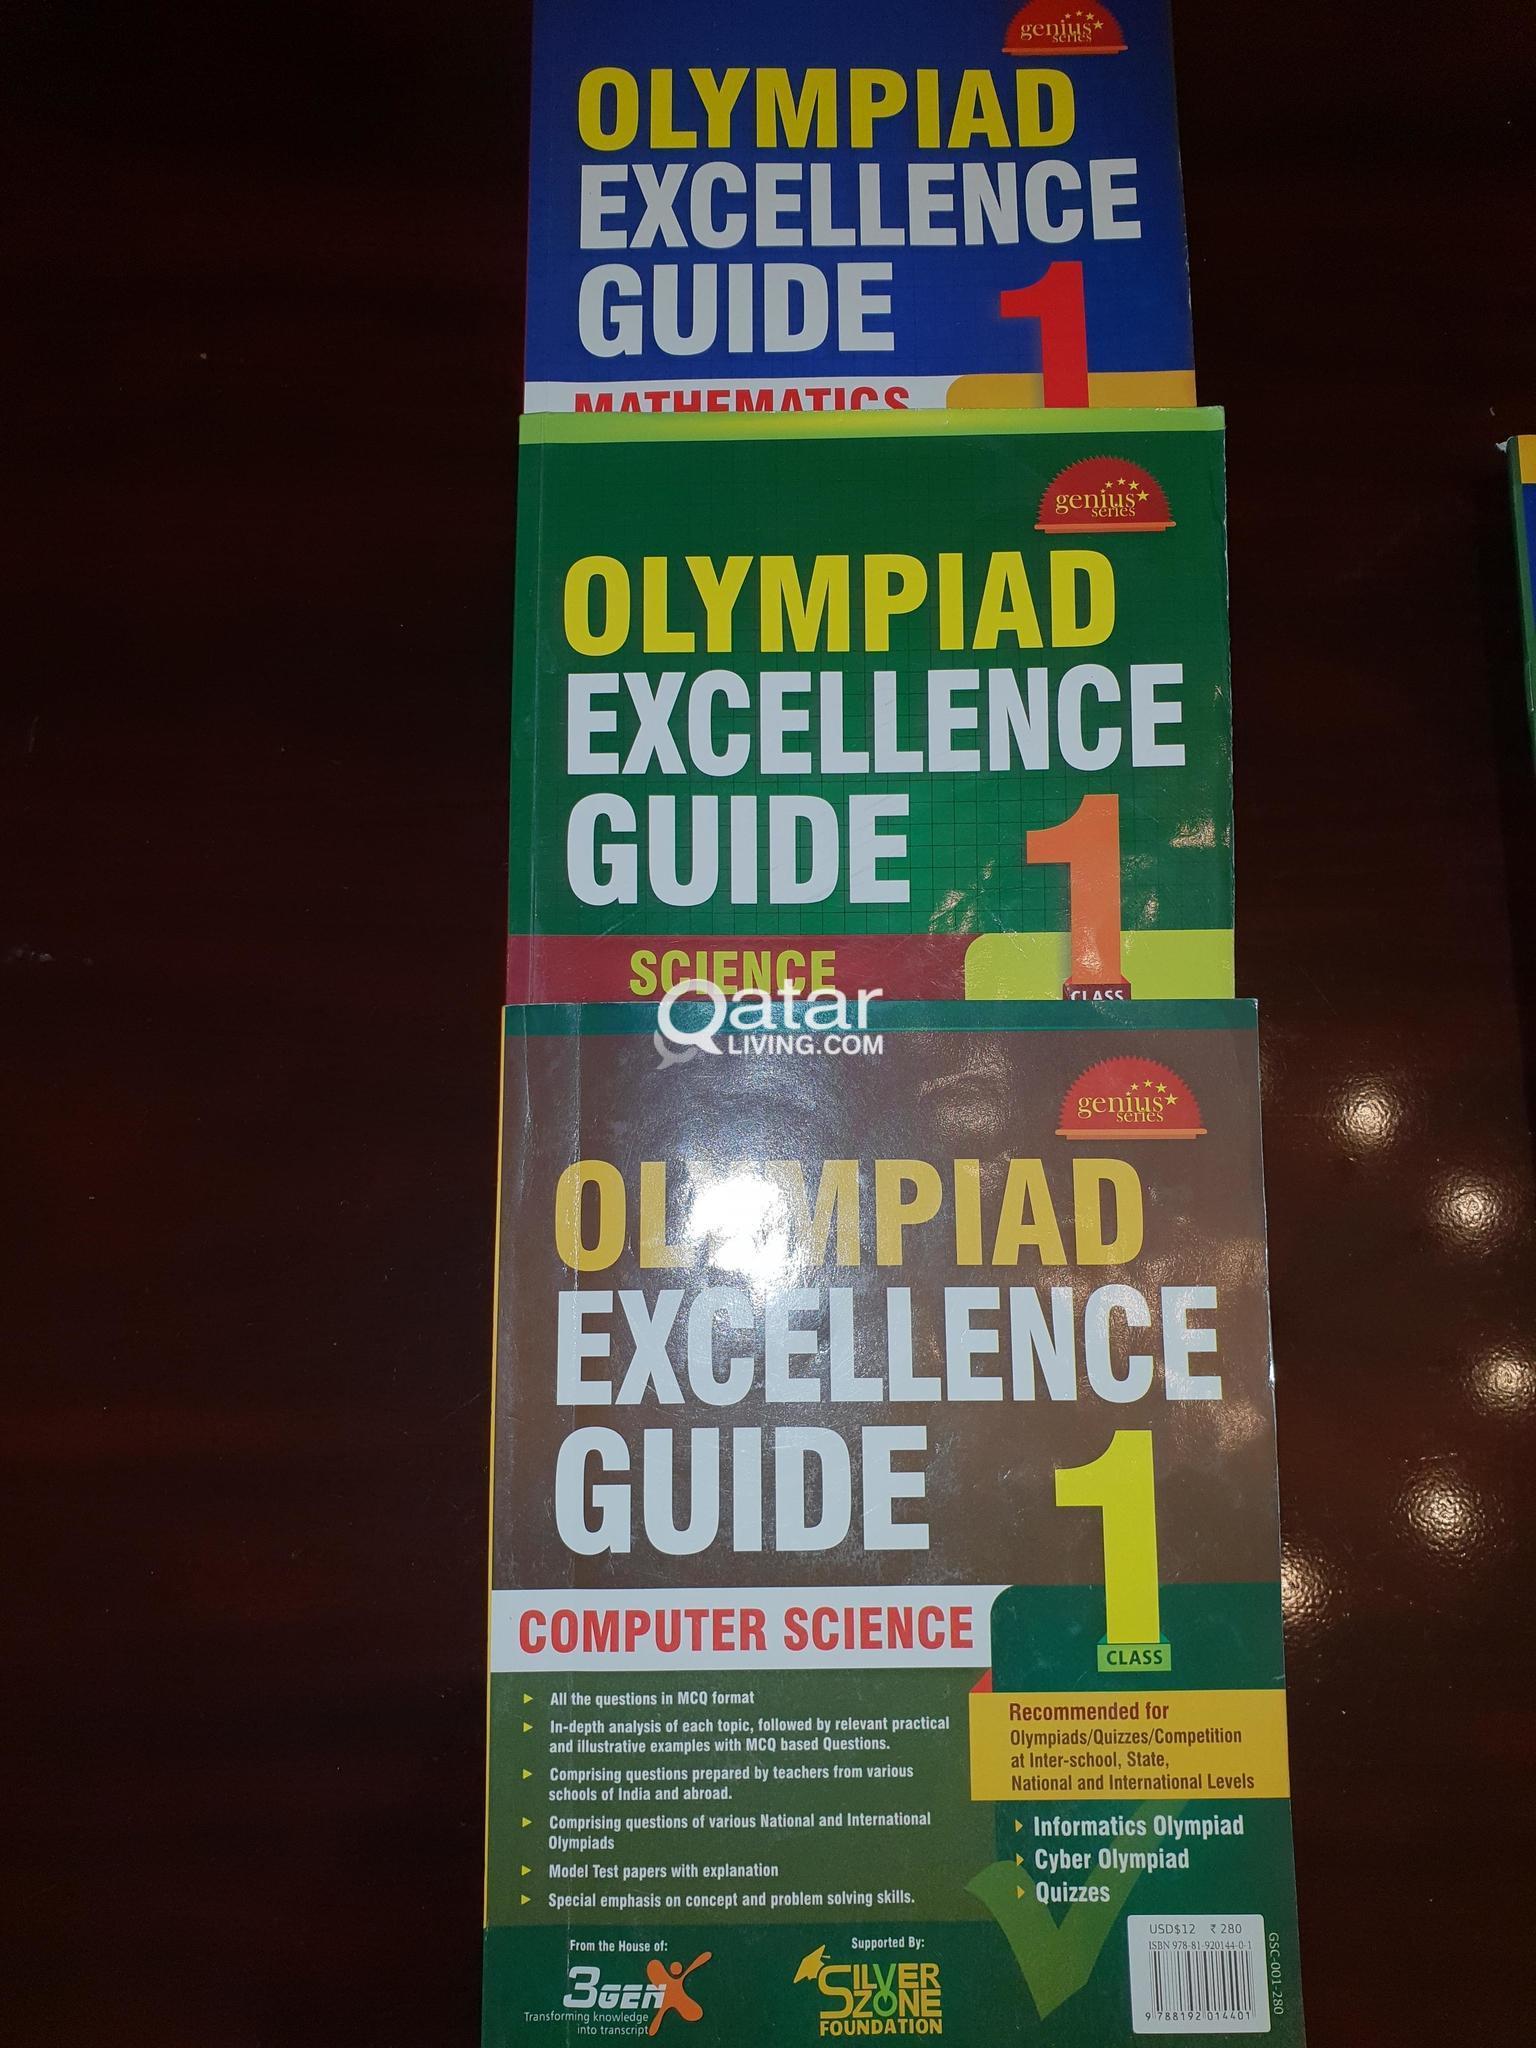 Carefully used Olympiad books (Class1)   Qatar Living